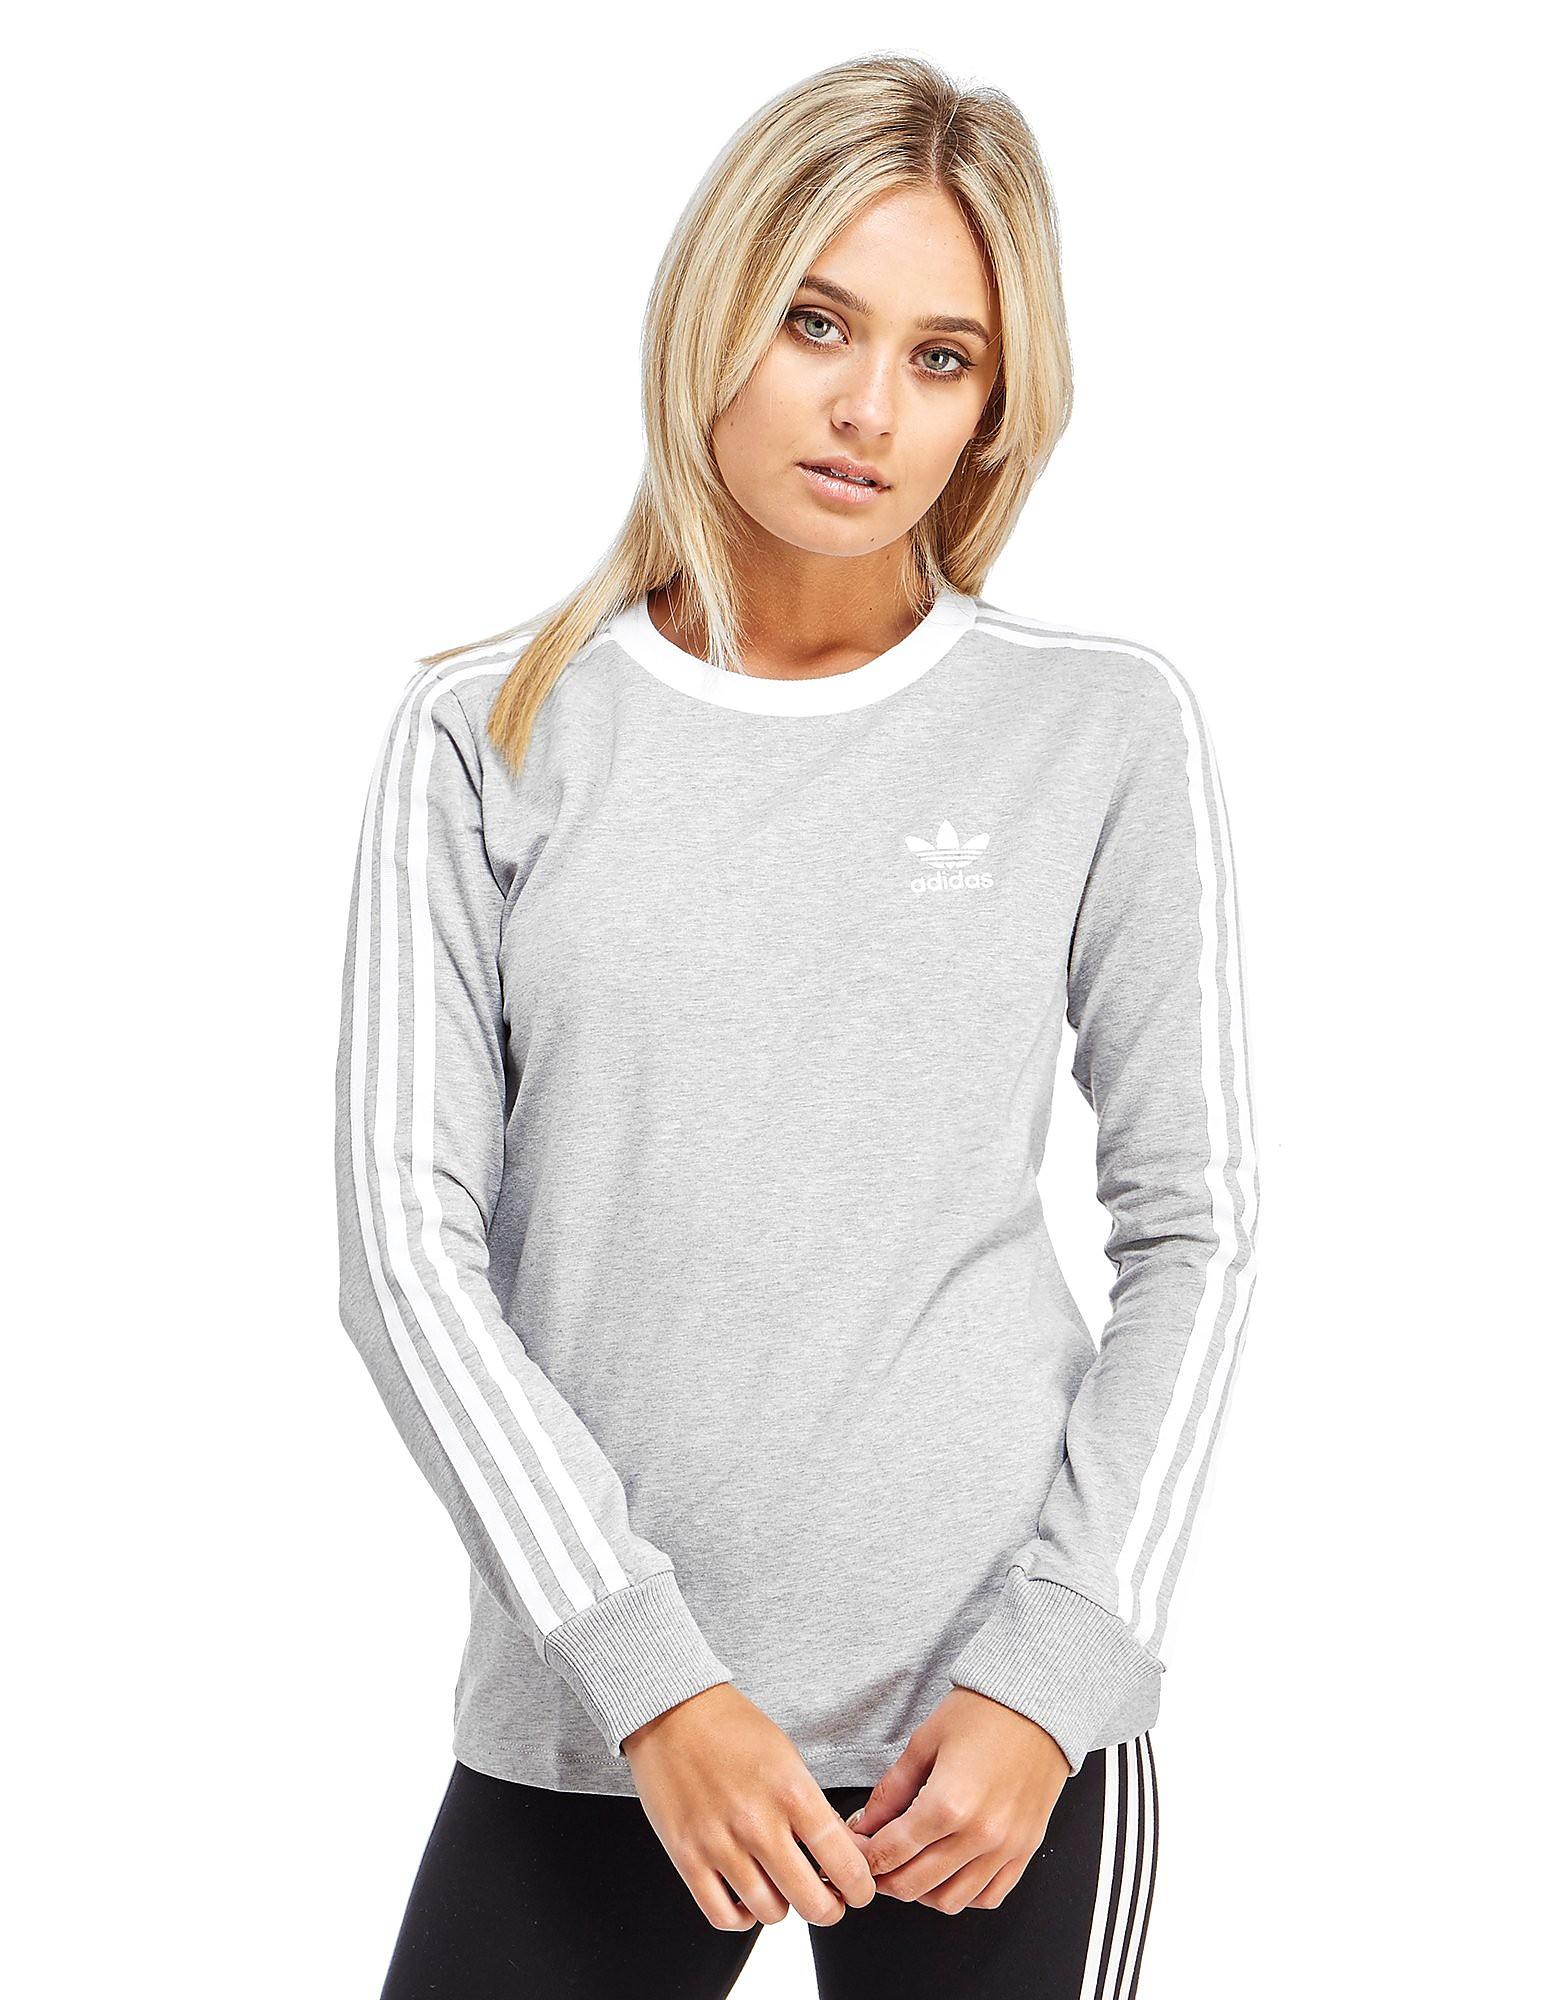 adidas Originals 3 Stripe Long-Sleeved T-Shirt